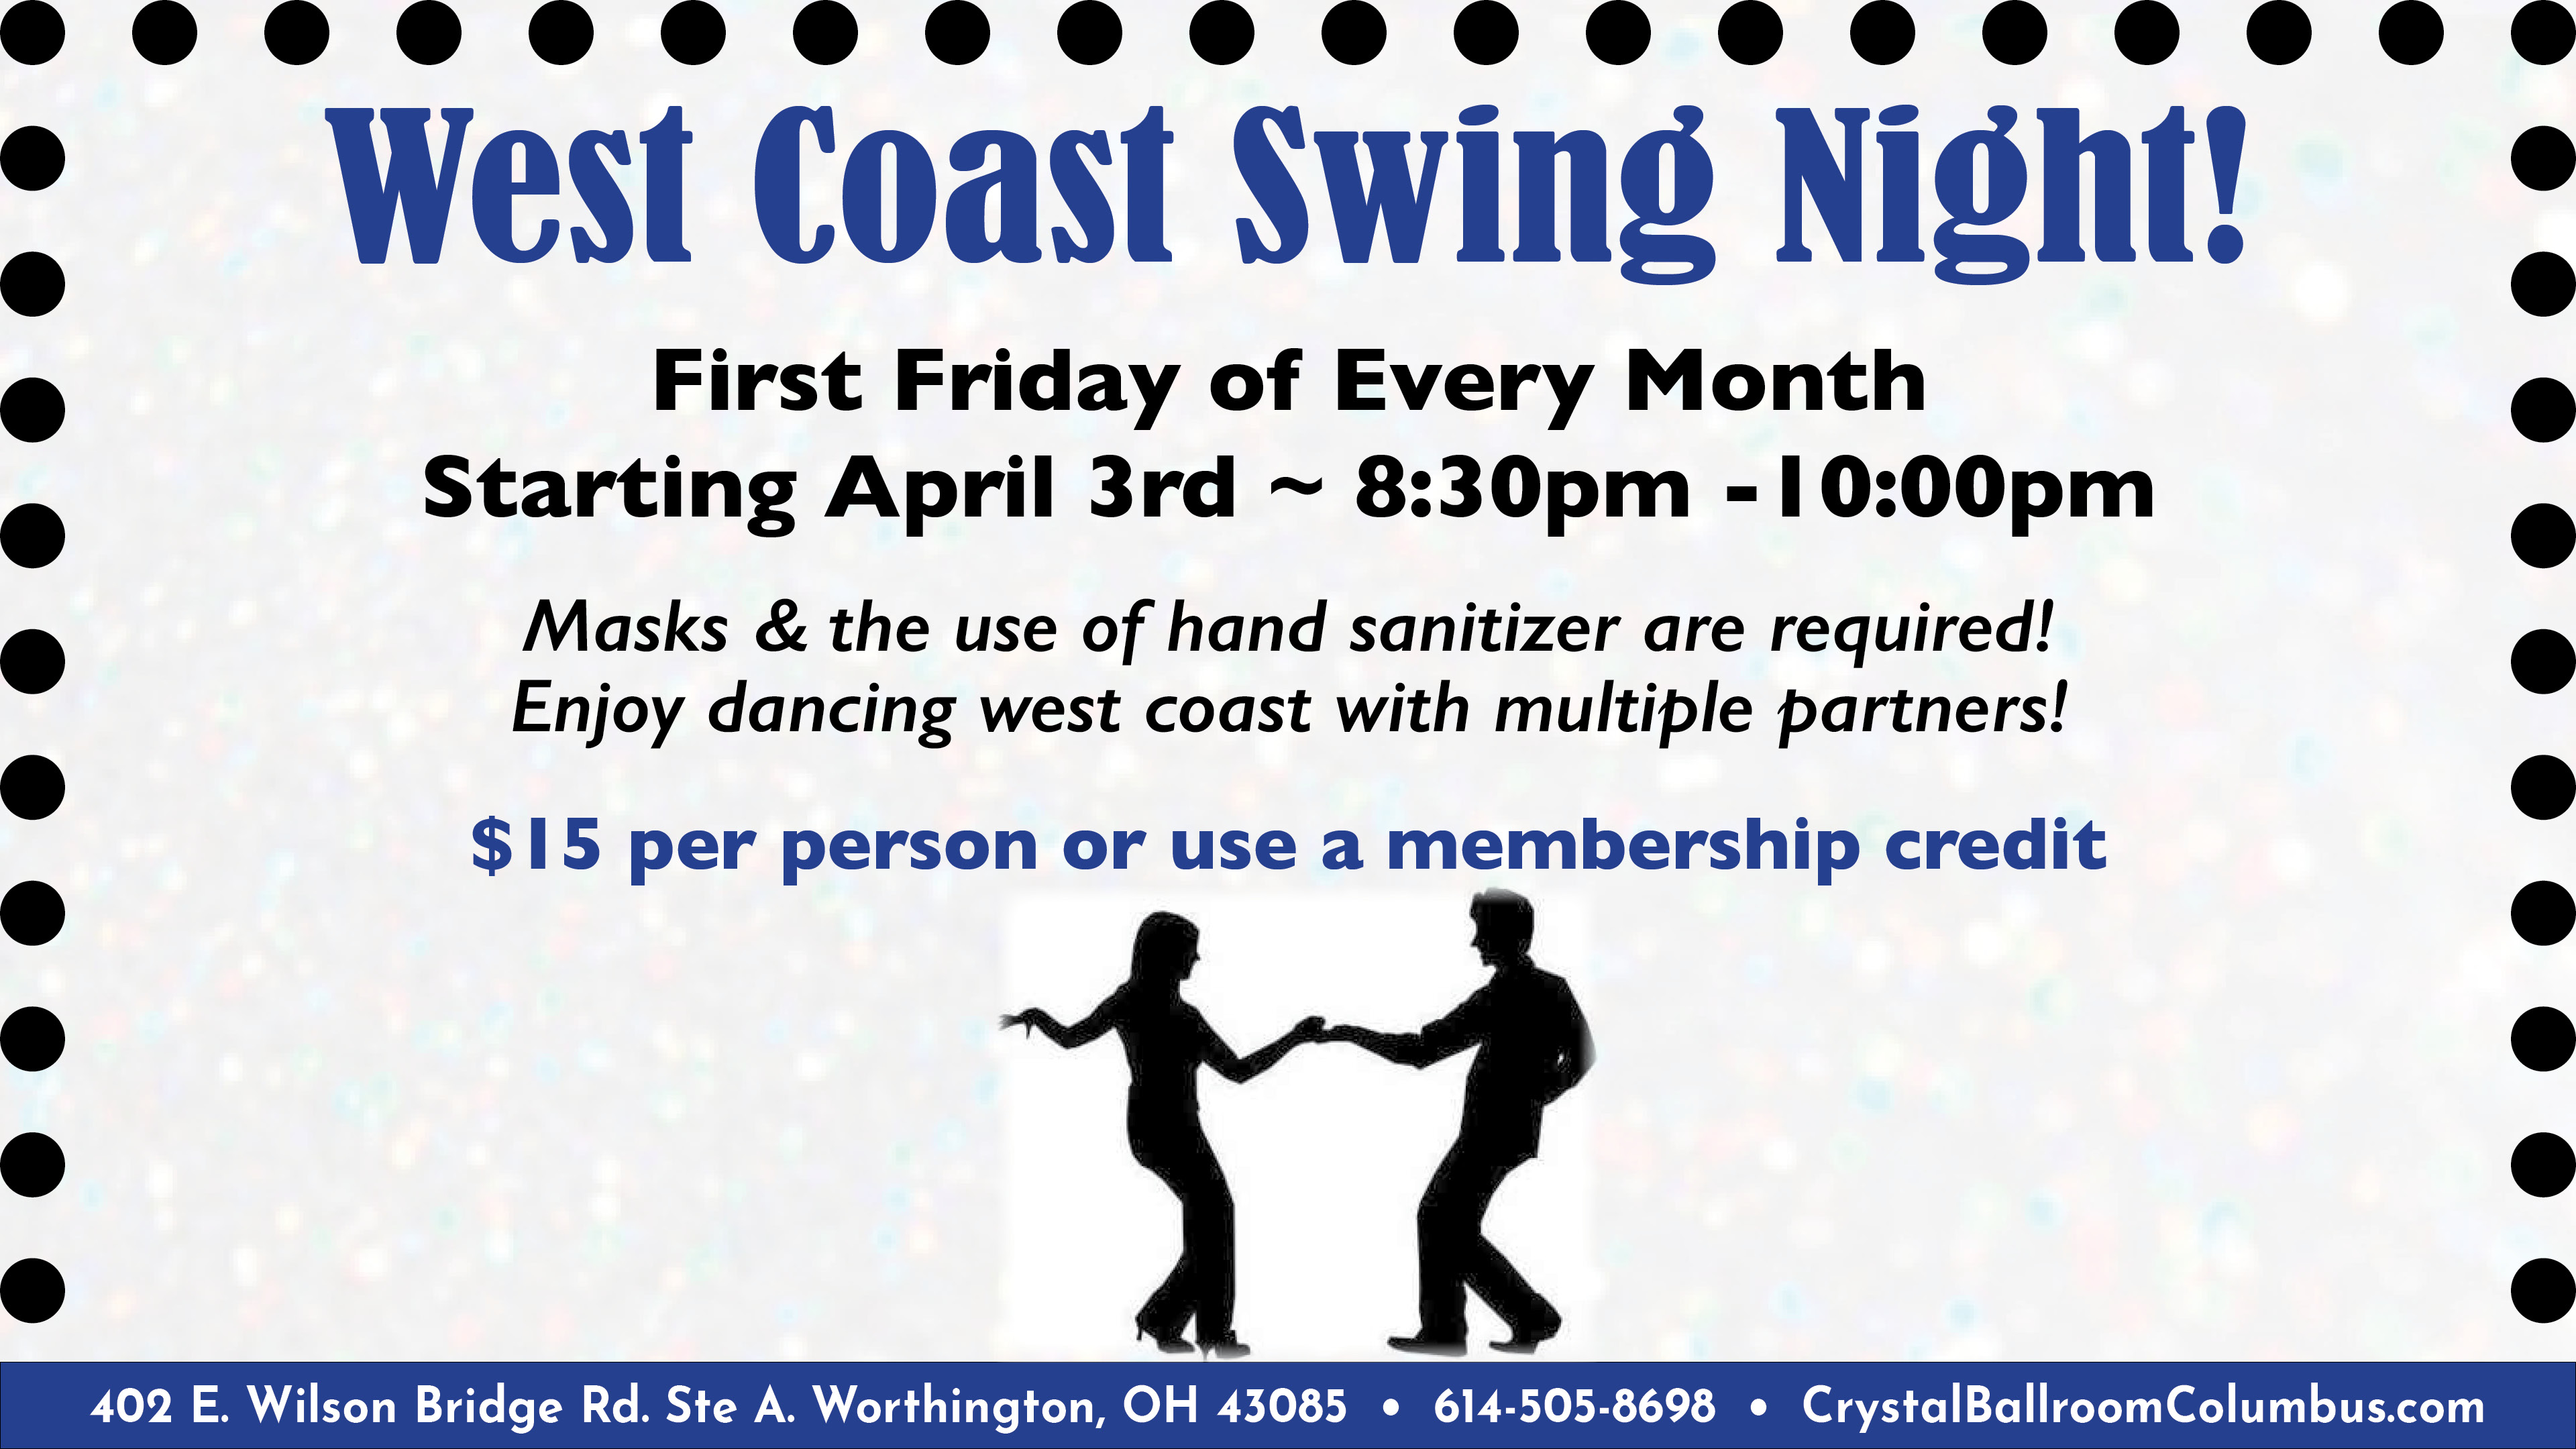 West Coast Swing Night Dance